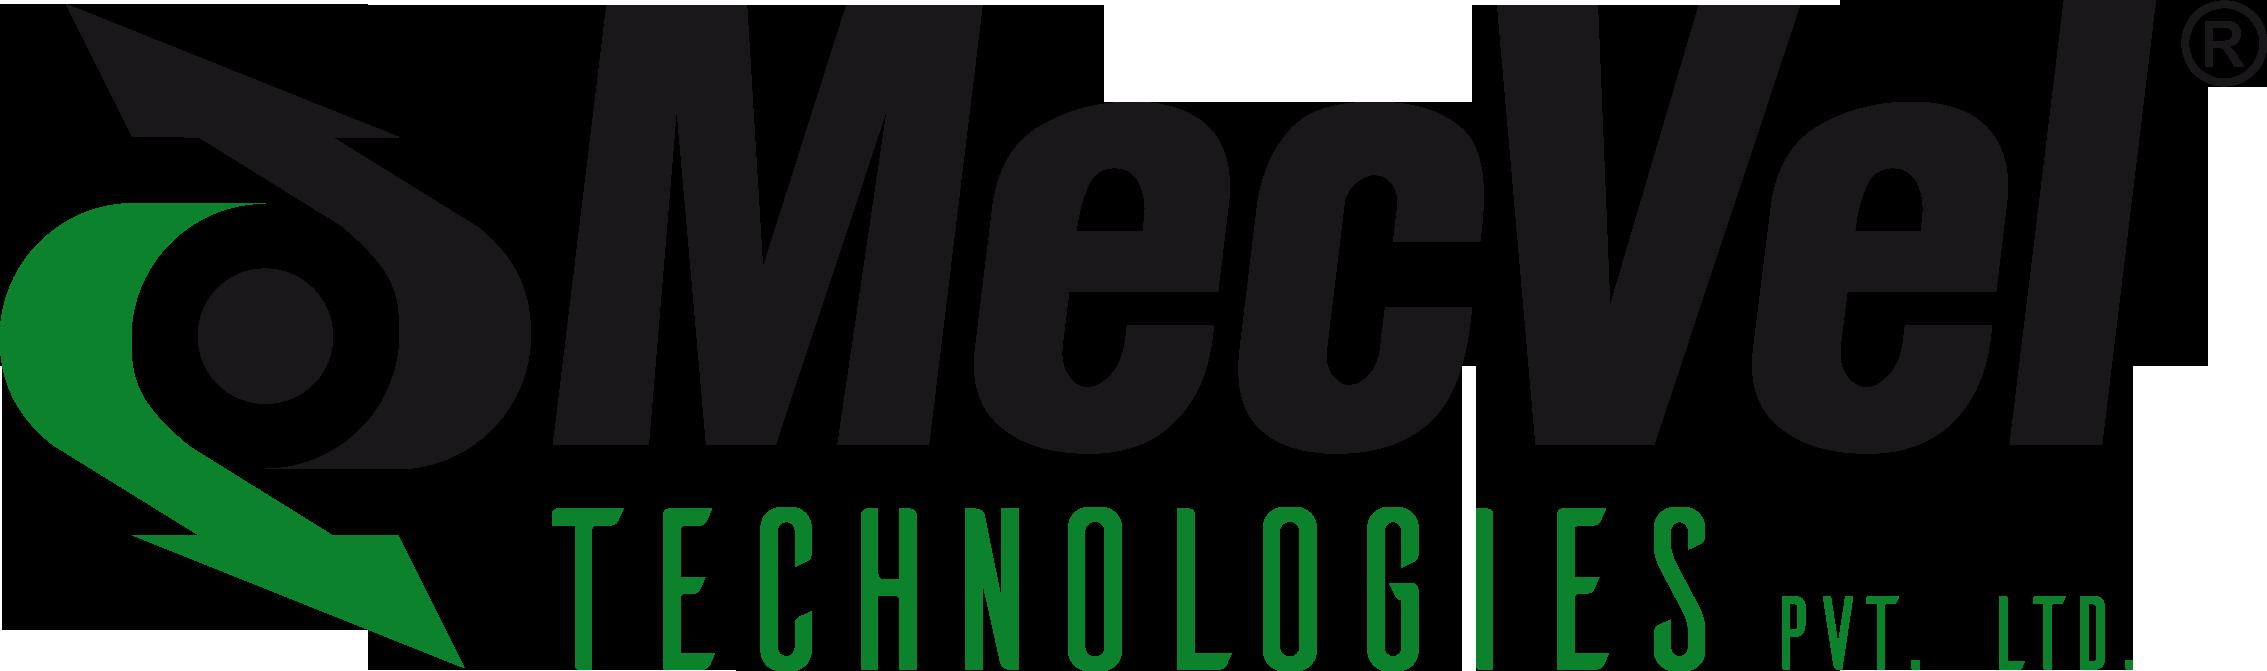 MecVel Technologies India